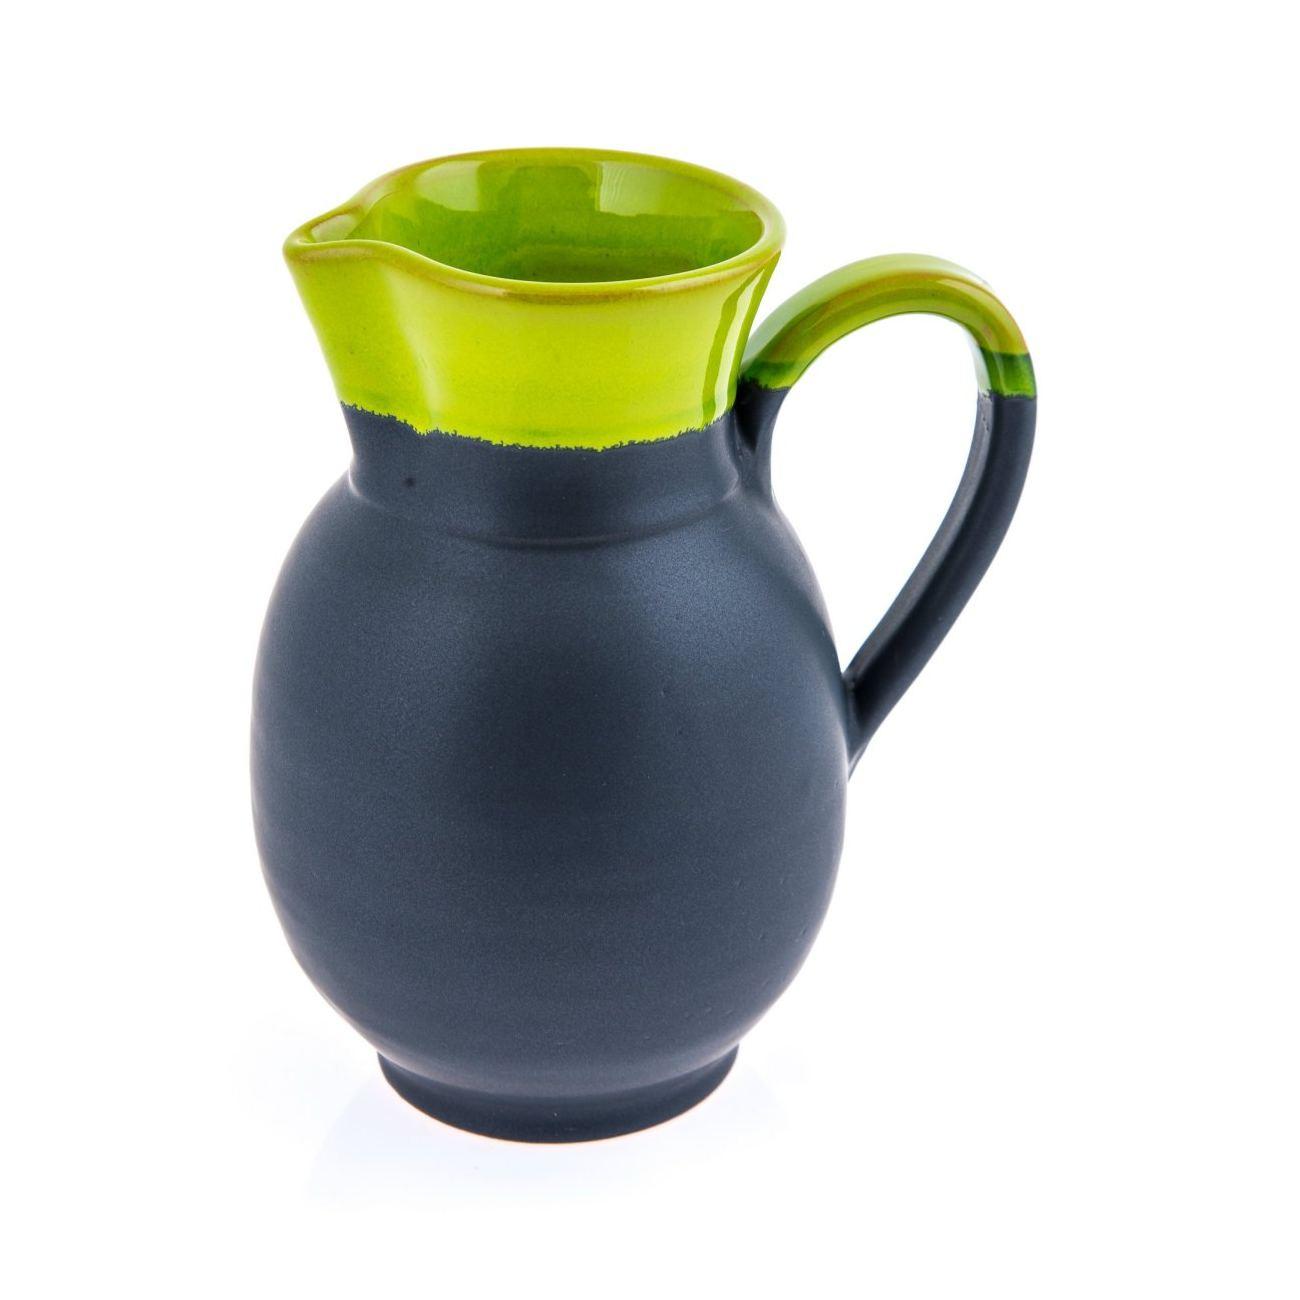 stylish handmade ceramic decanter or pitcher green  grey   - modern  stylish handmade ceramic decanter or pitcher green  grey ''(cm)